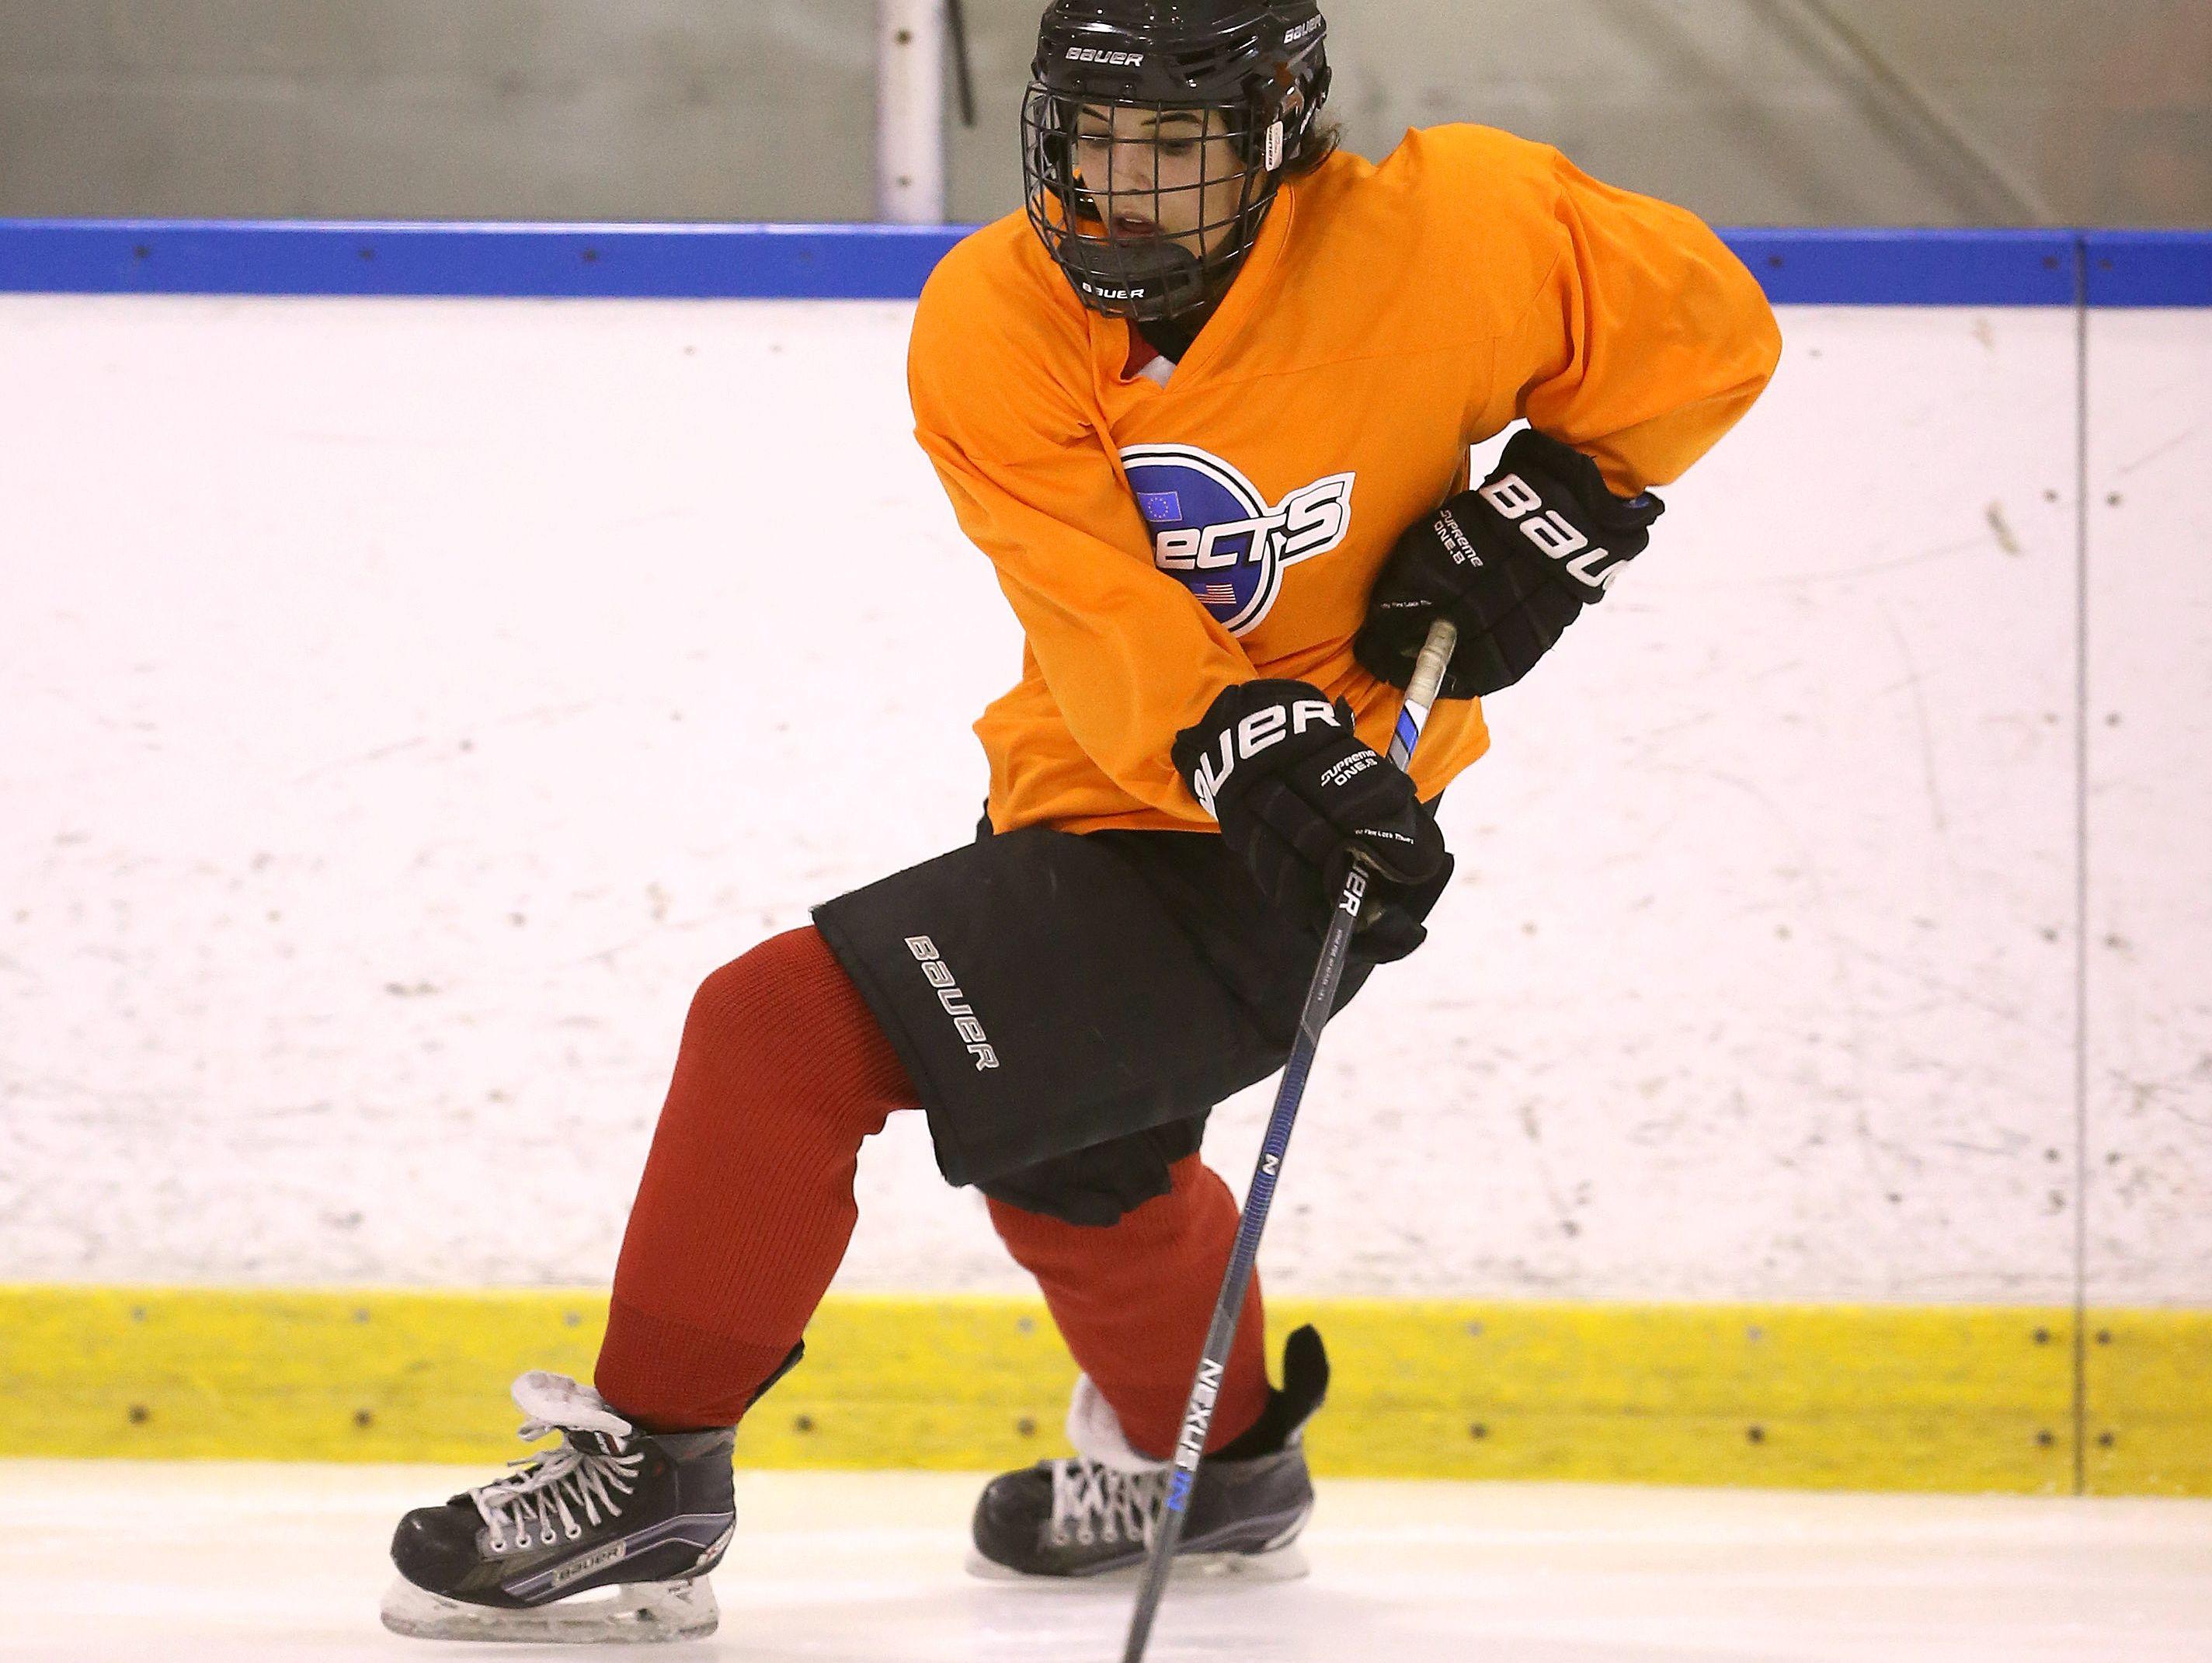 Bishop Kearney's Sydney Bard during an early season hockey practice. Kearney is in its first year of having an elite girls hockey program.